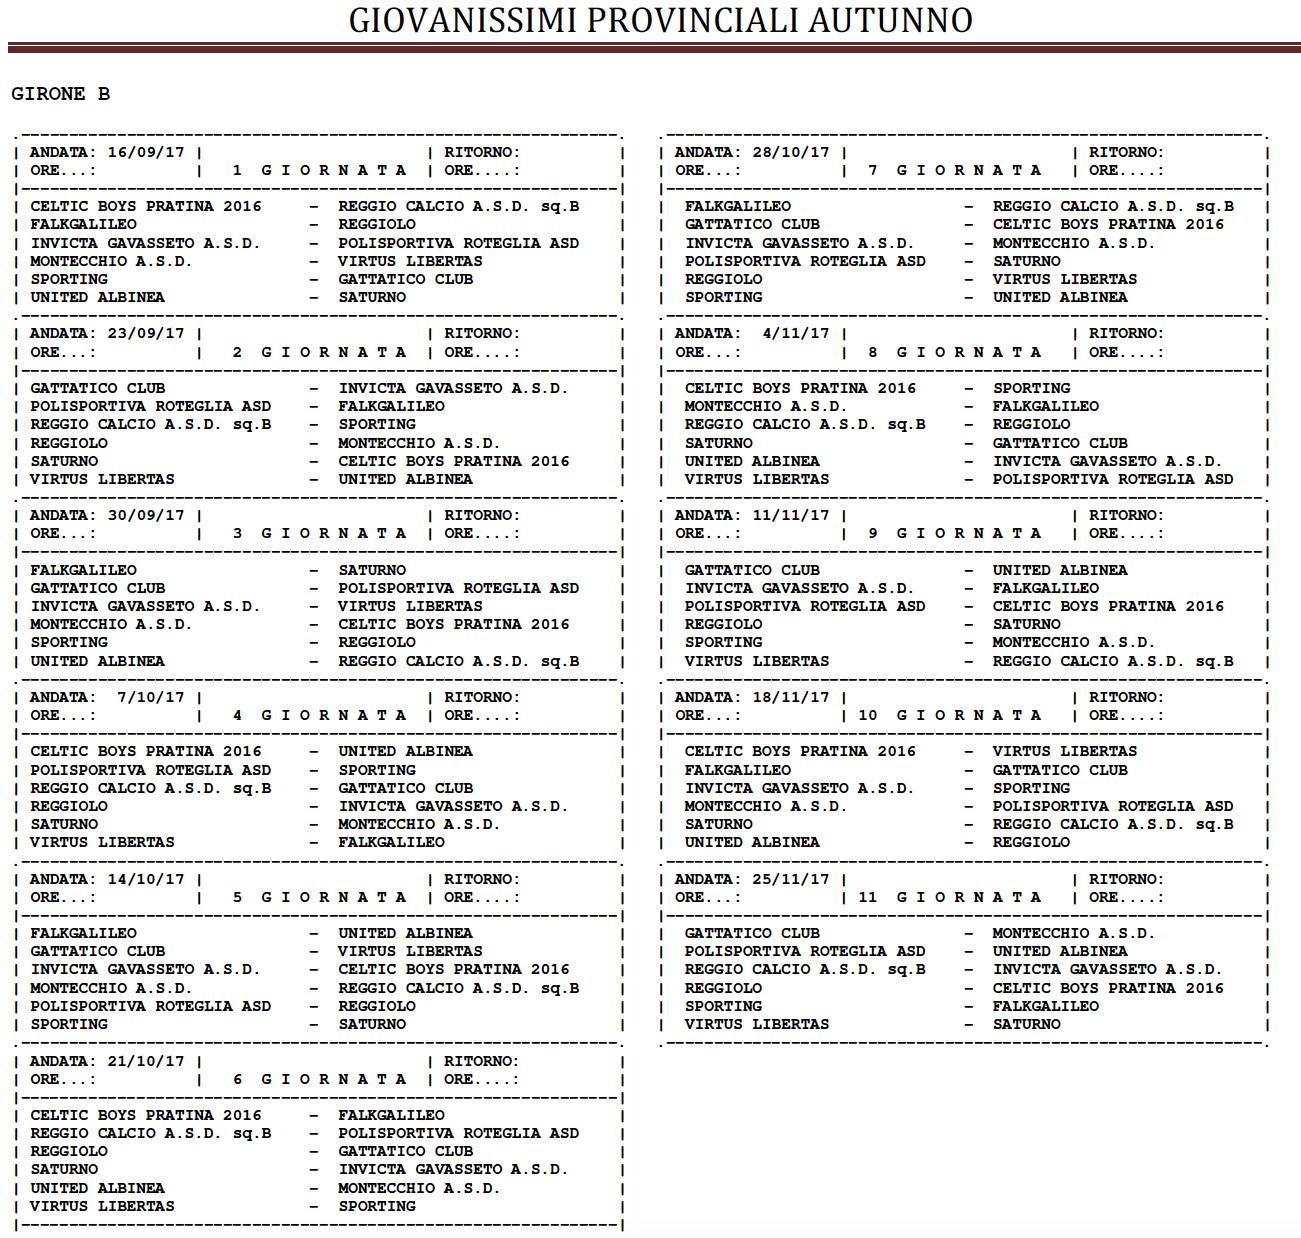 Calendario Giovanissimi Provinciali.Calendario Giovanissimi Provinciali Celtic Boys Pratina